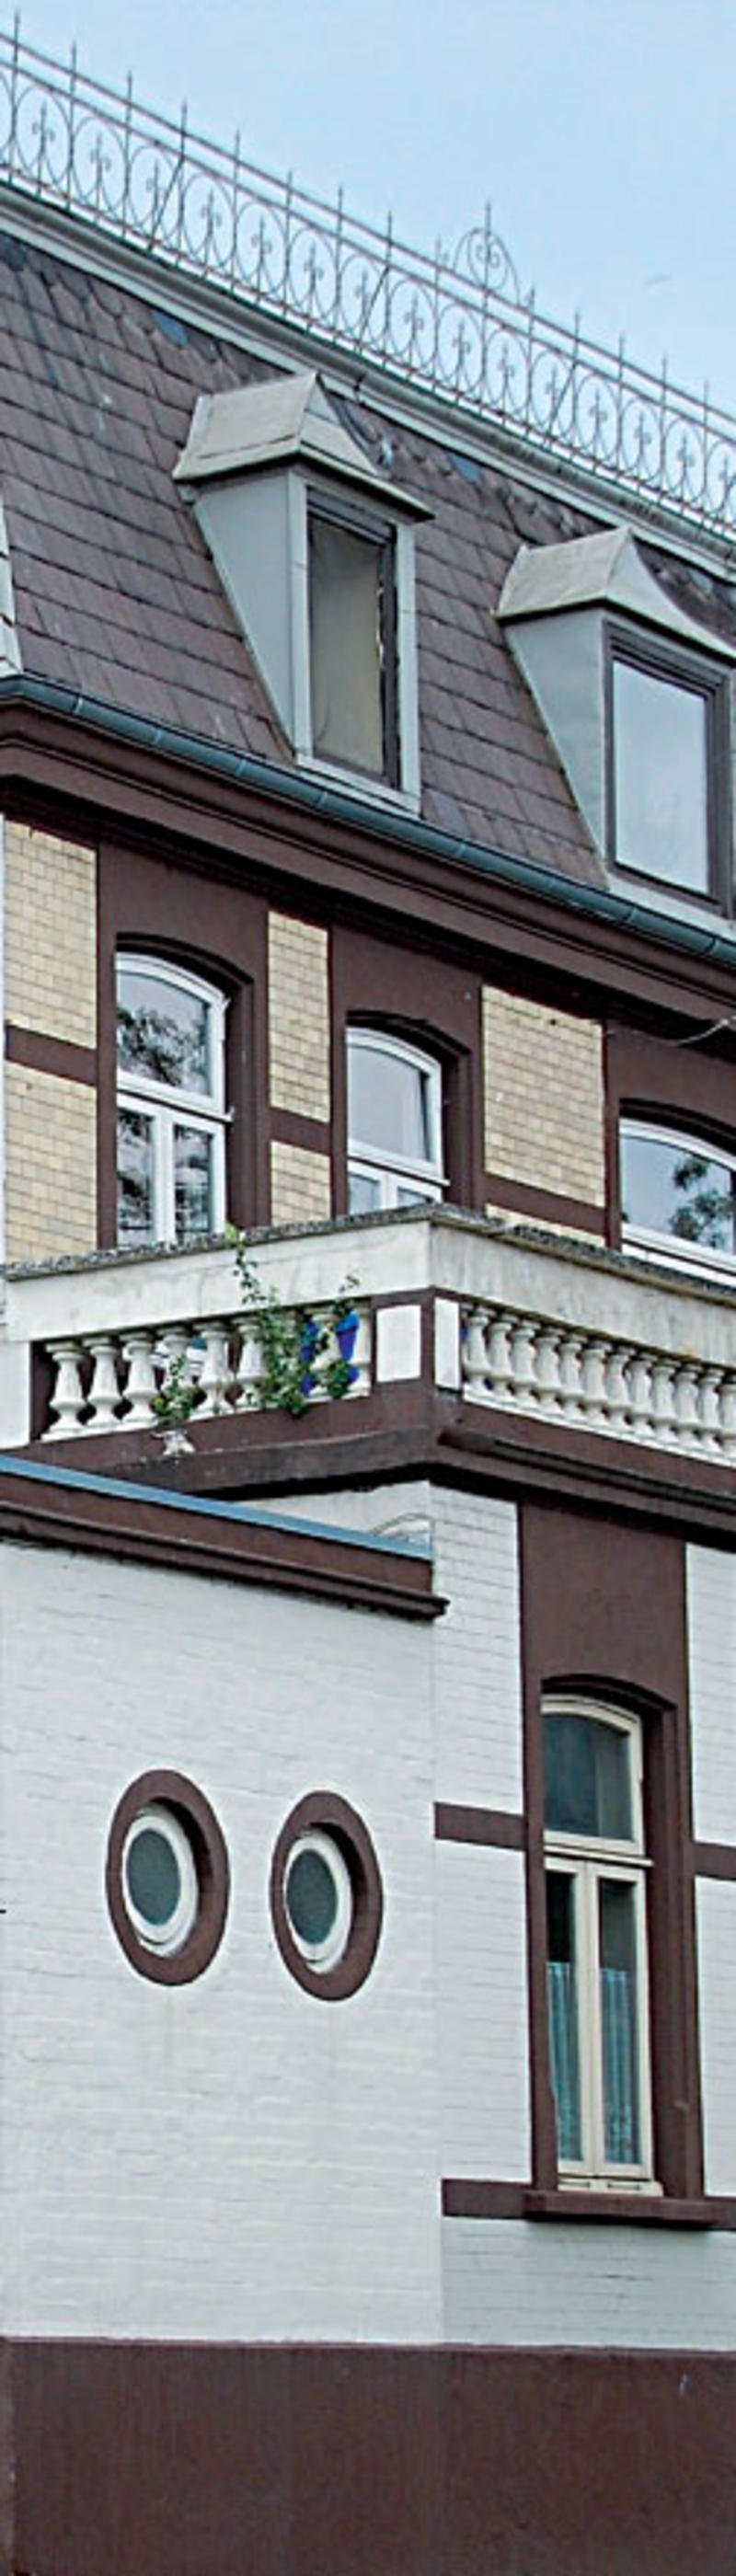 Volkshochschule Hotel Hamburg